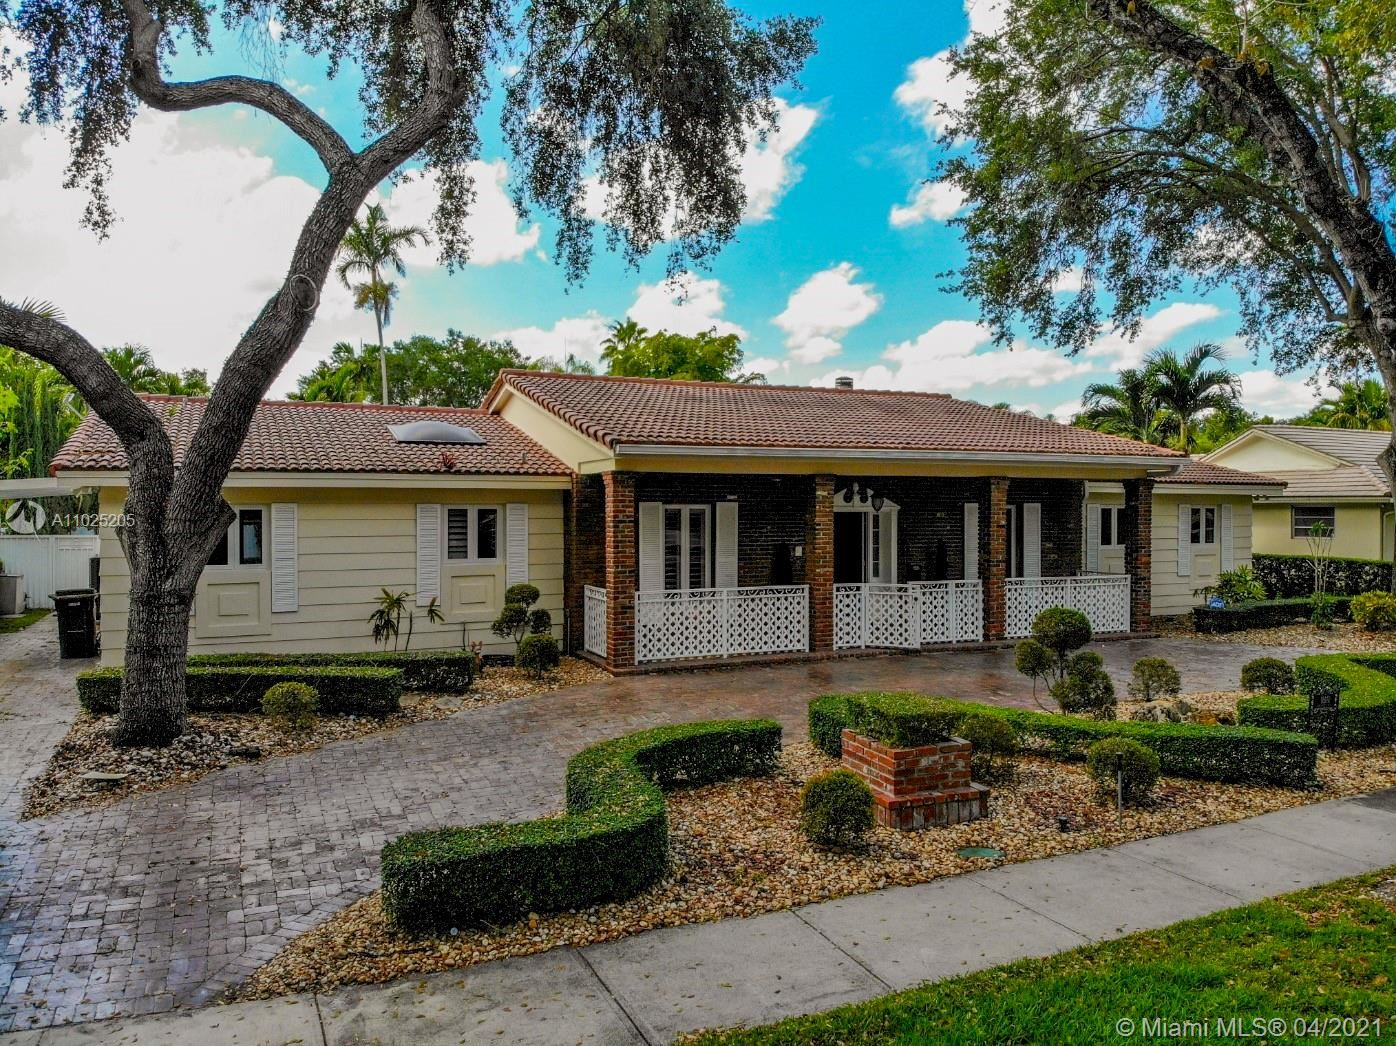 16140 Aberdeen Way, Miami Lakes, FL 33014 - #: A11025205